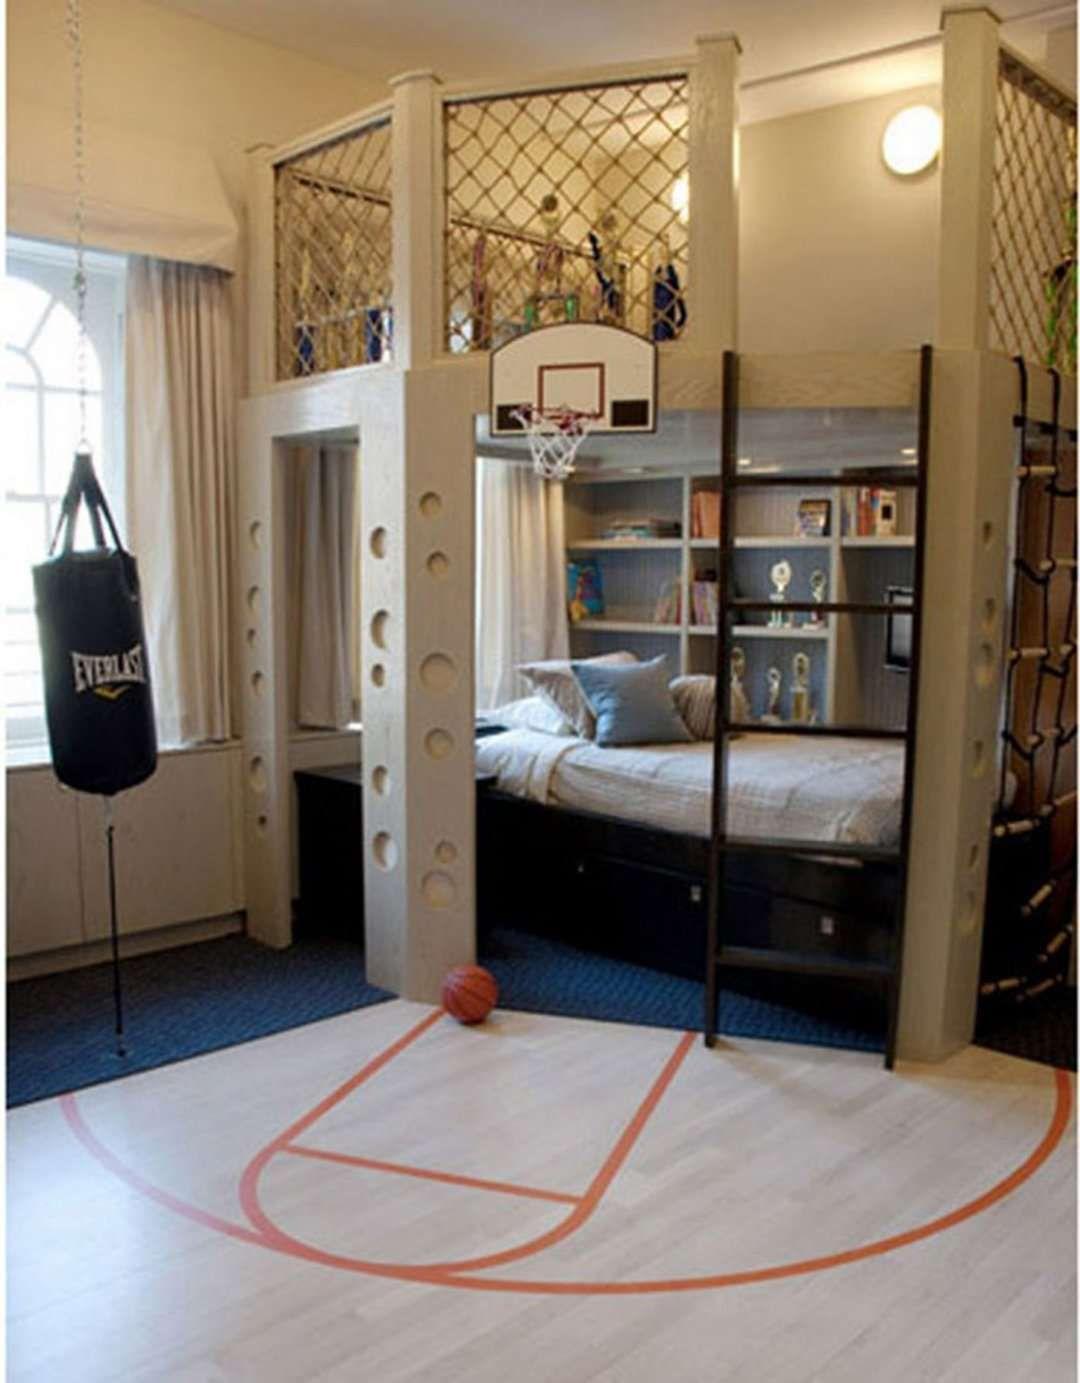 10 Year Old Boy Bedroom Designs House Decor Interior